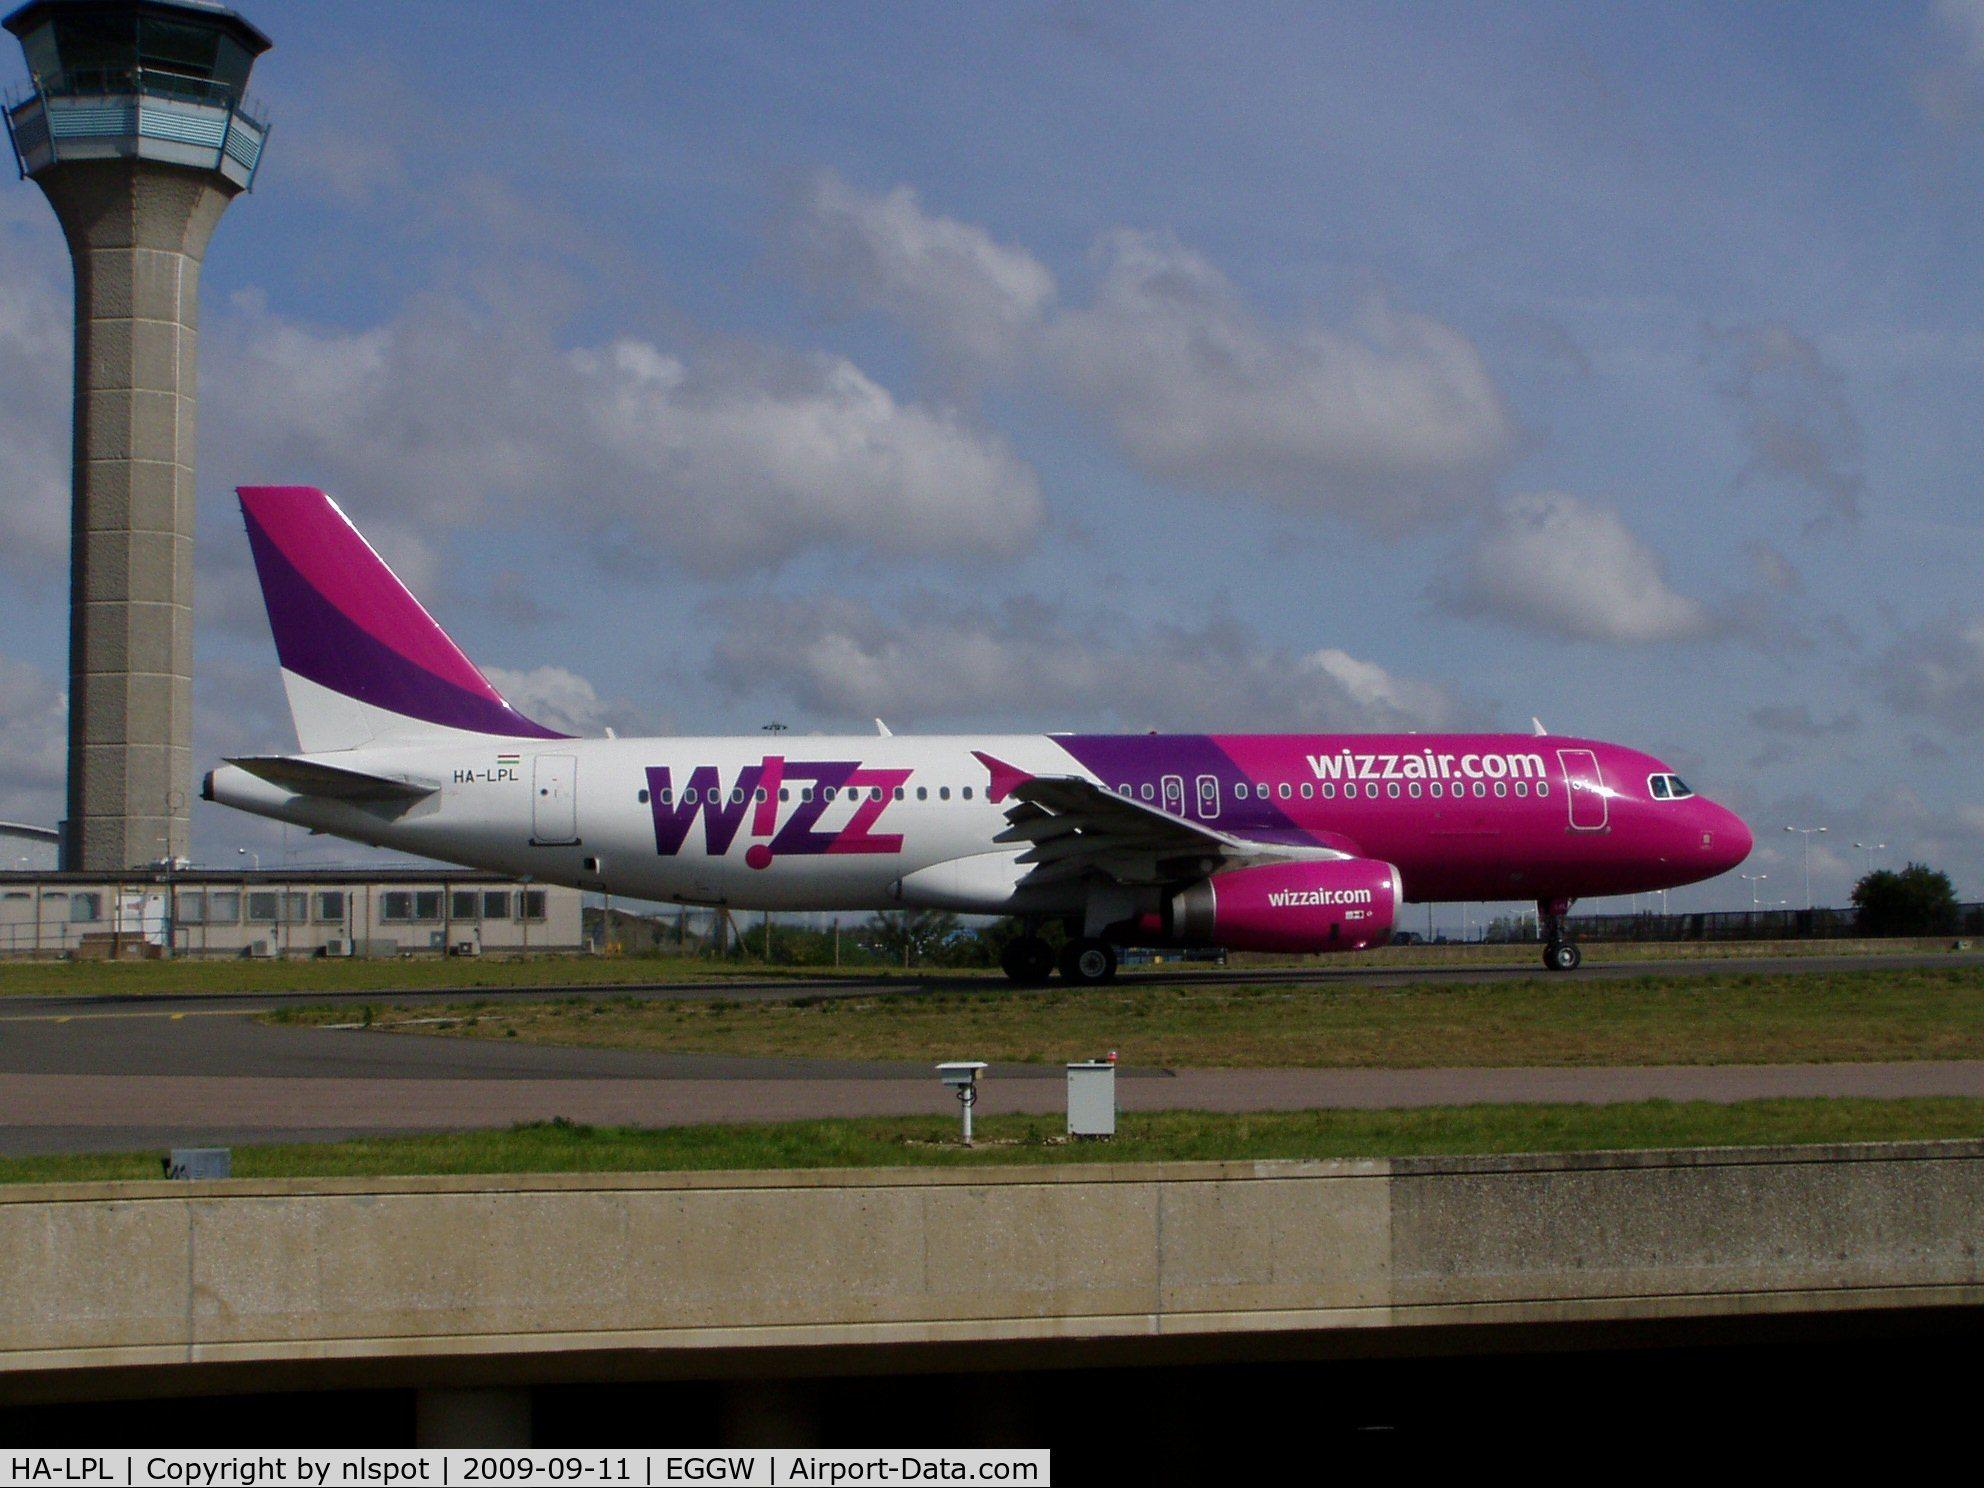 HA-LPL, 2007 Airbus A320-232 C/N 3166, ...